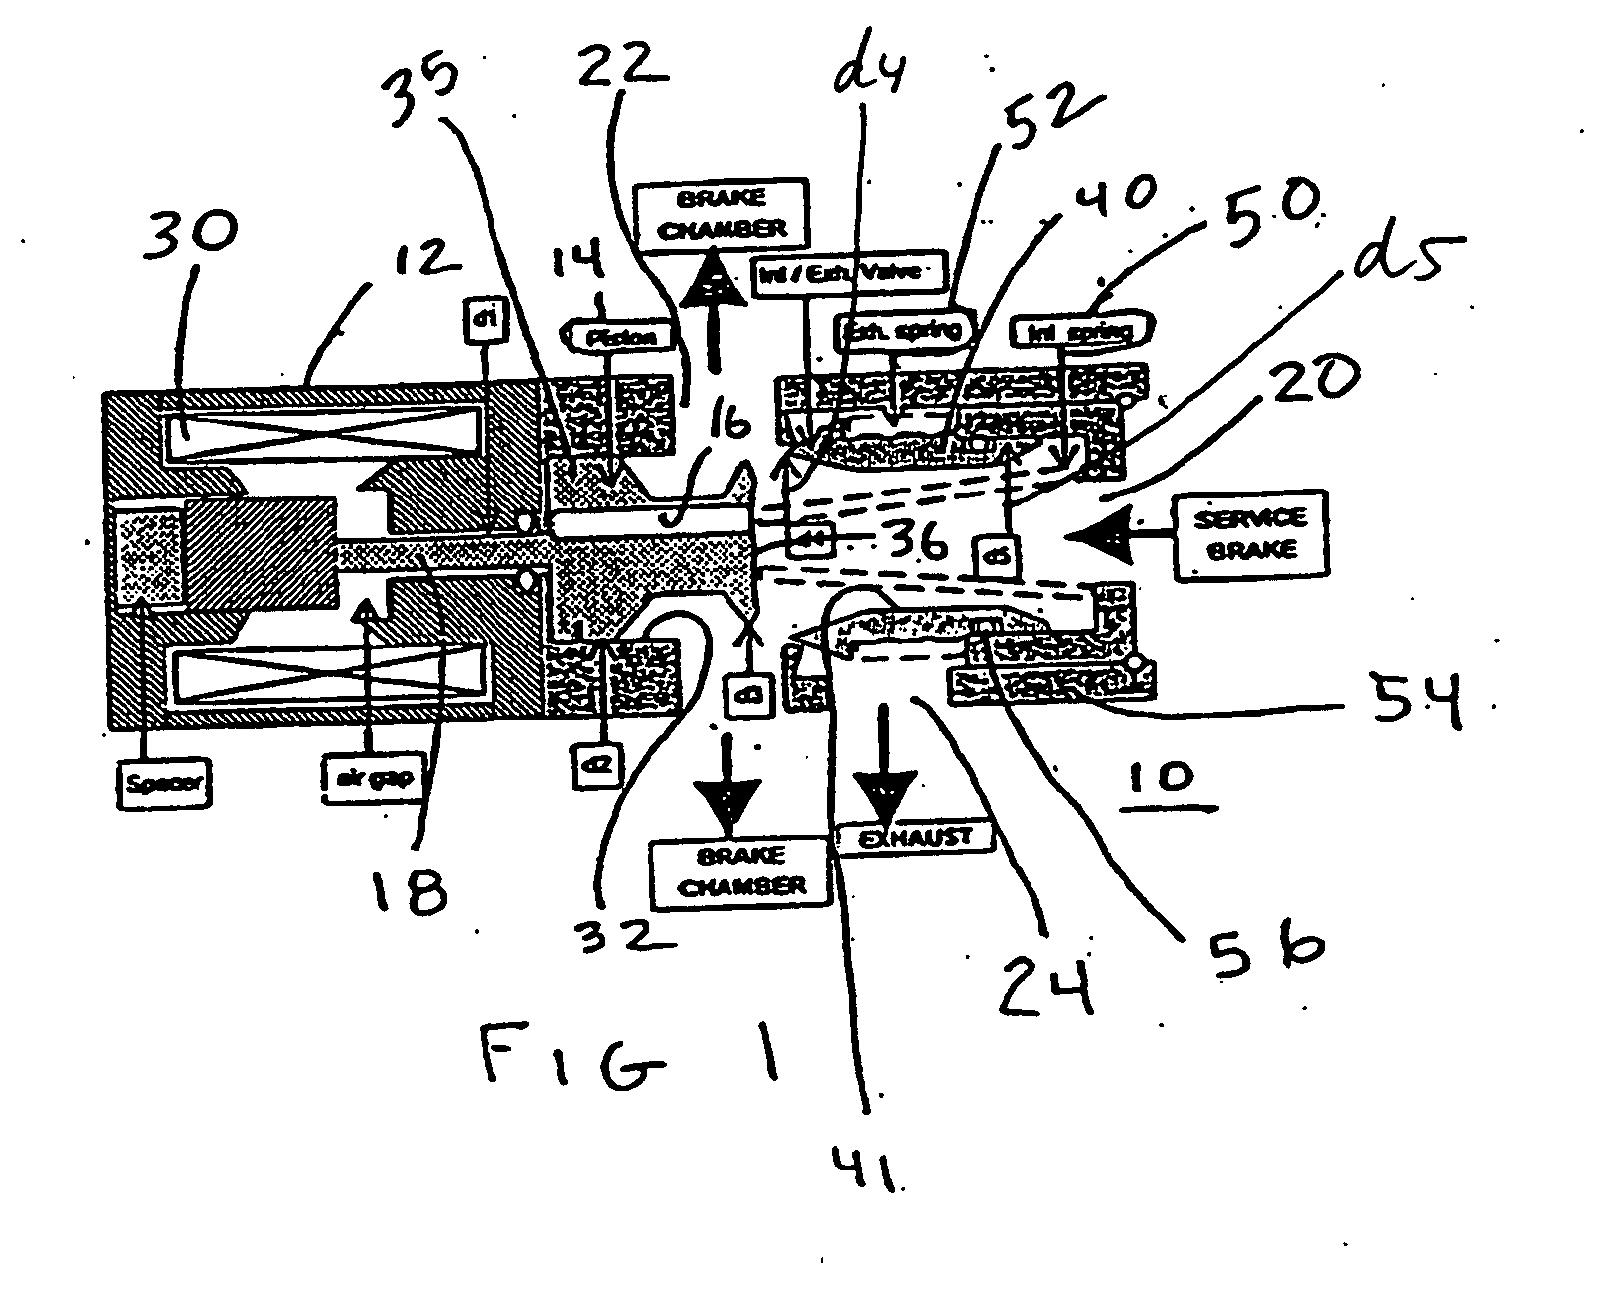 1999 chevy silverado brake line diagram 2006 hayabusa wiring 95 mustang abs free engine image for